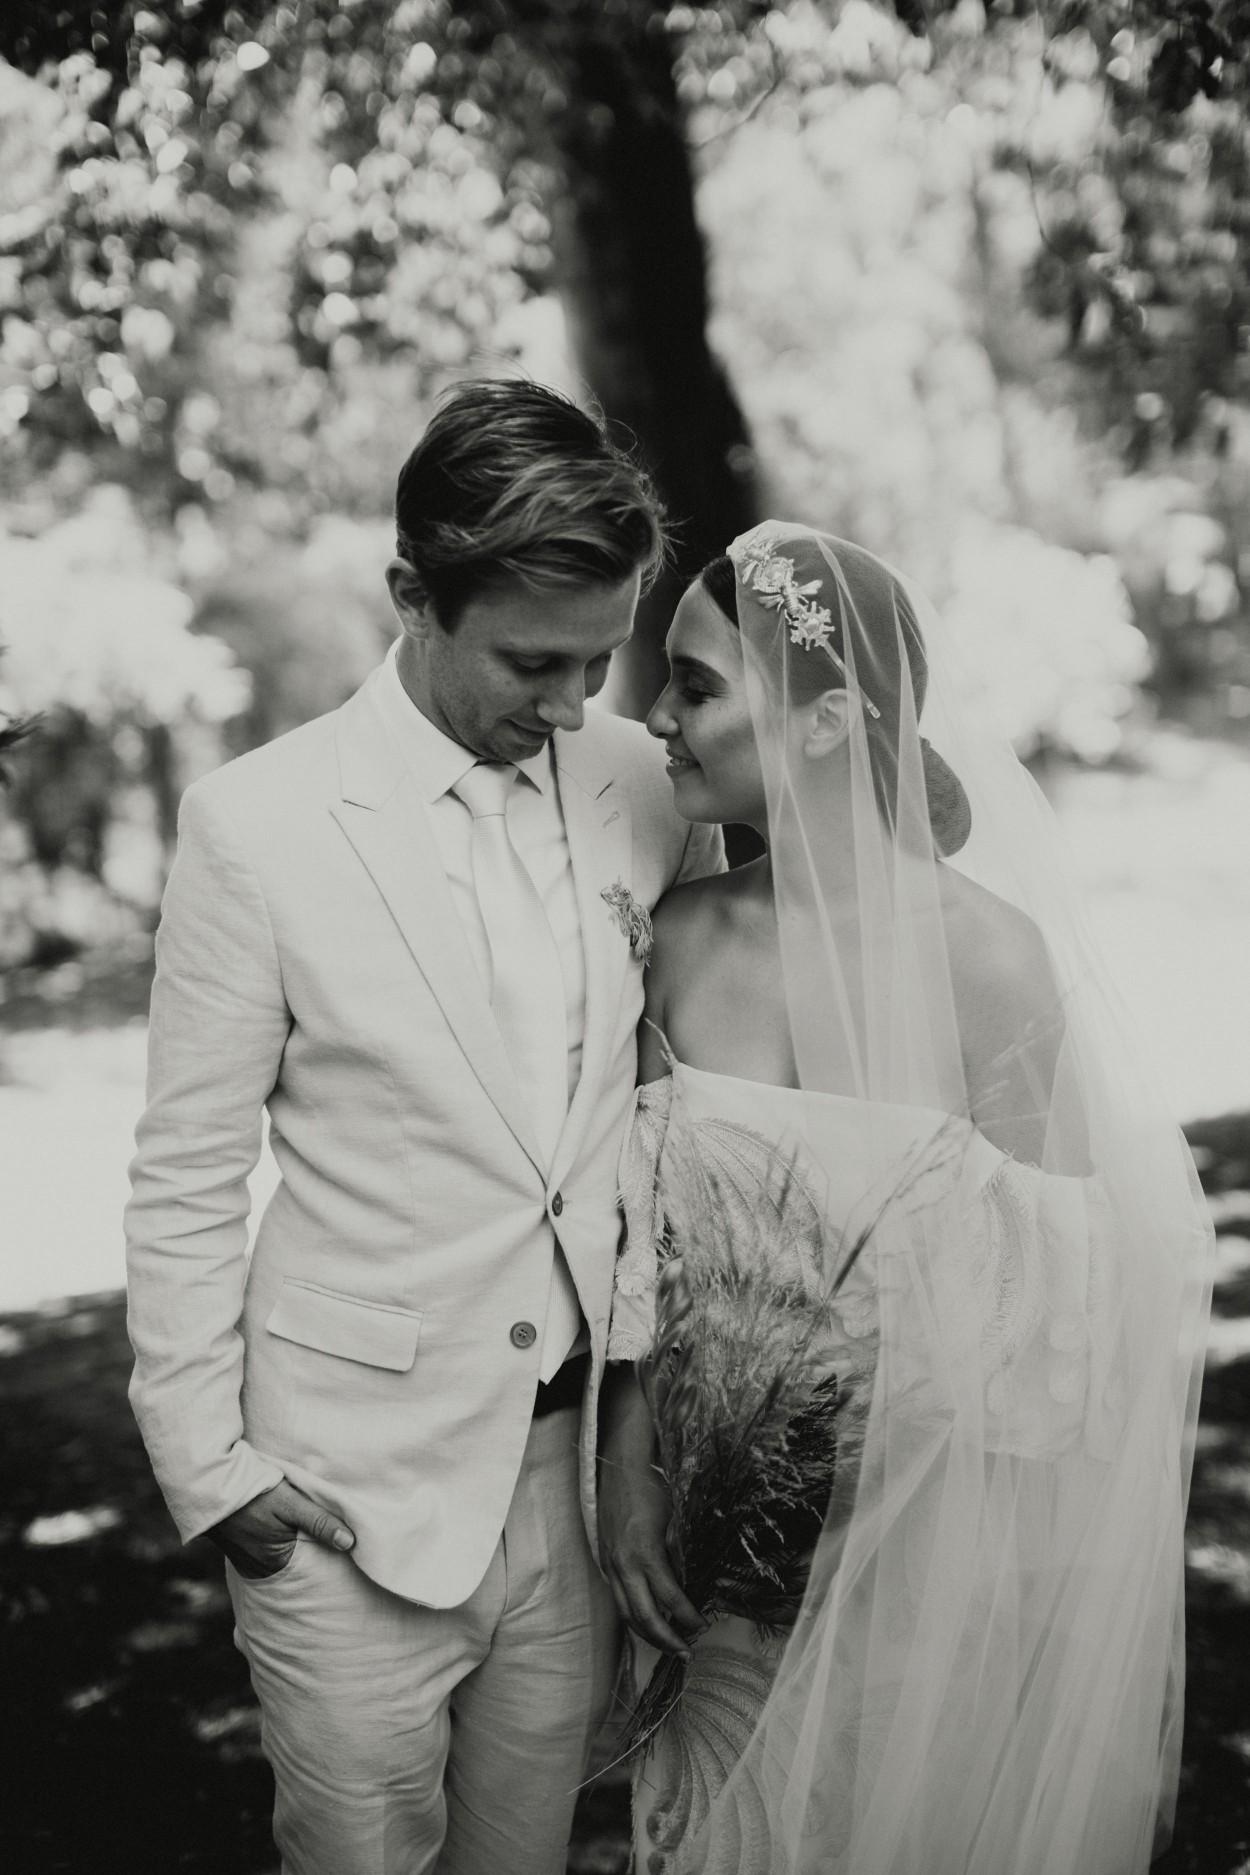 I-Got-You-Babe-Weddings-Heide-Museum-of-Modern-Art-Elopement-Susie-Nathan046.jpg